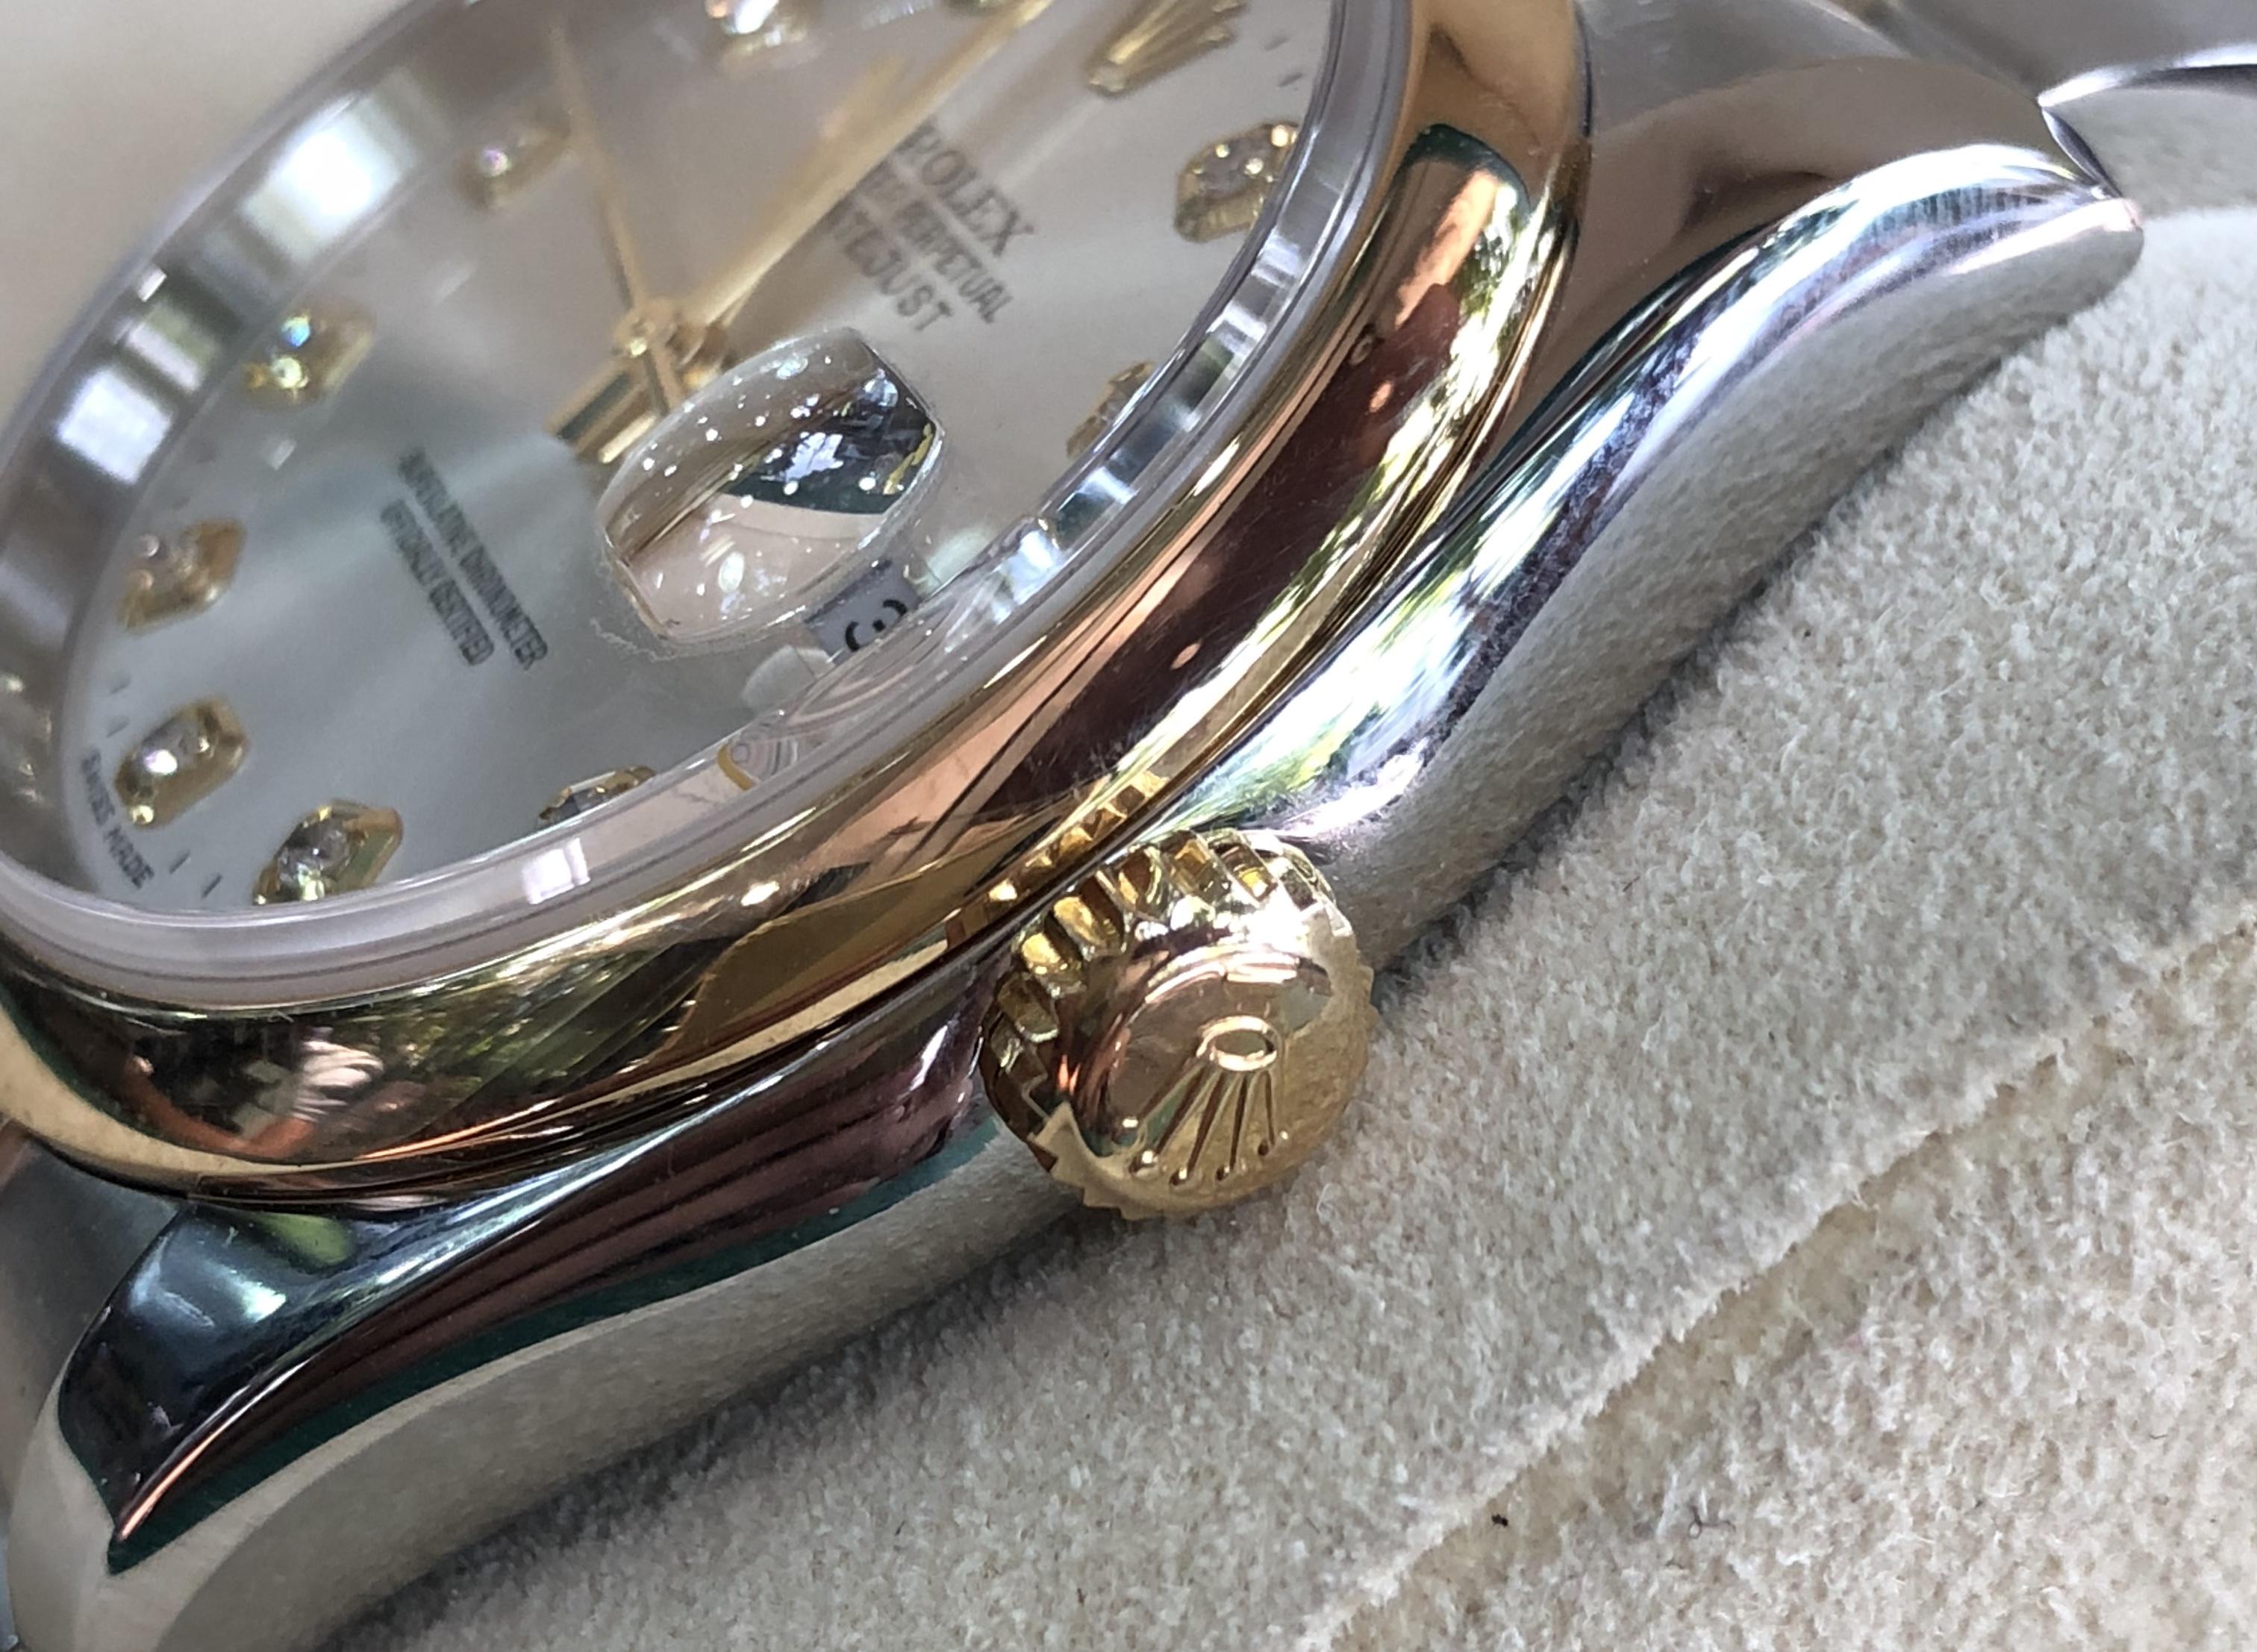 Rolex 116203 mặt tia demi vàng 18k sản xuất năm 2004